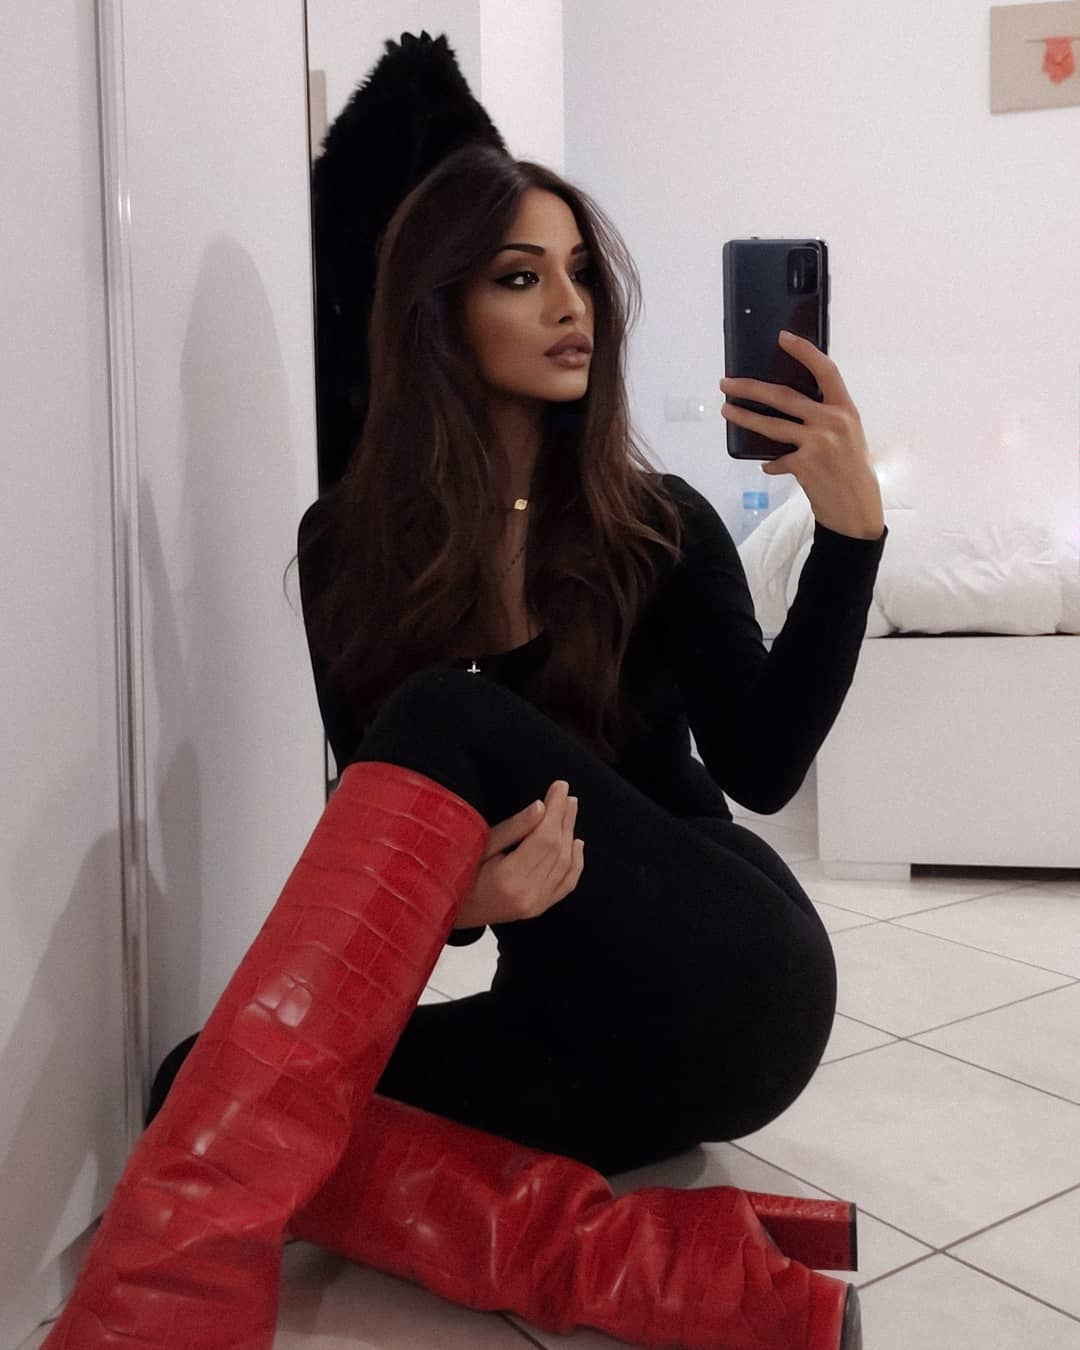 Alessia-Spagnulo-Wallpapers-Insta-Fit-Bio-4